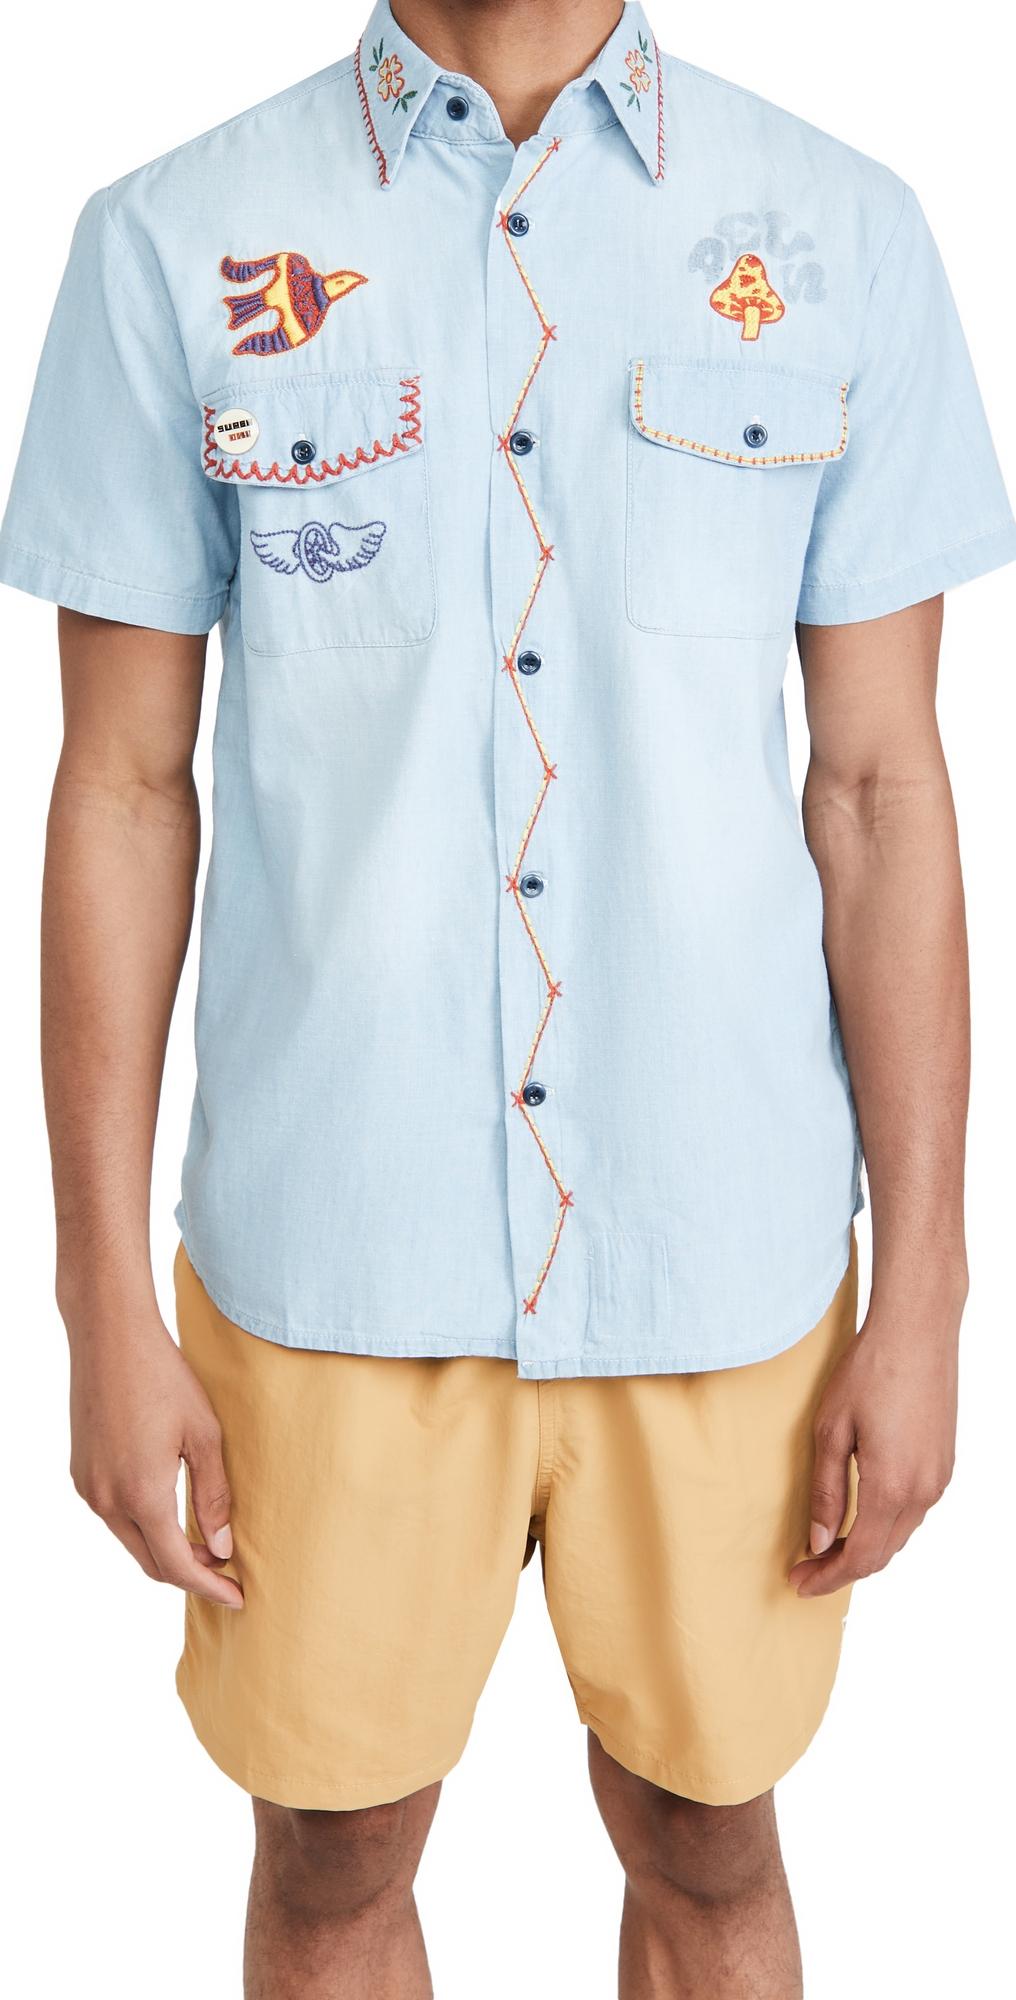 Buddy Utility Shirt